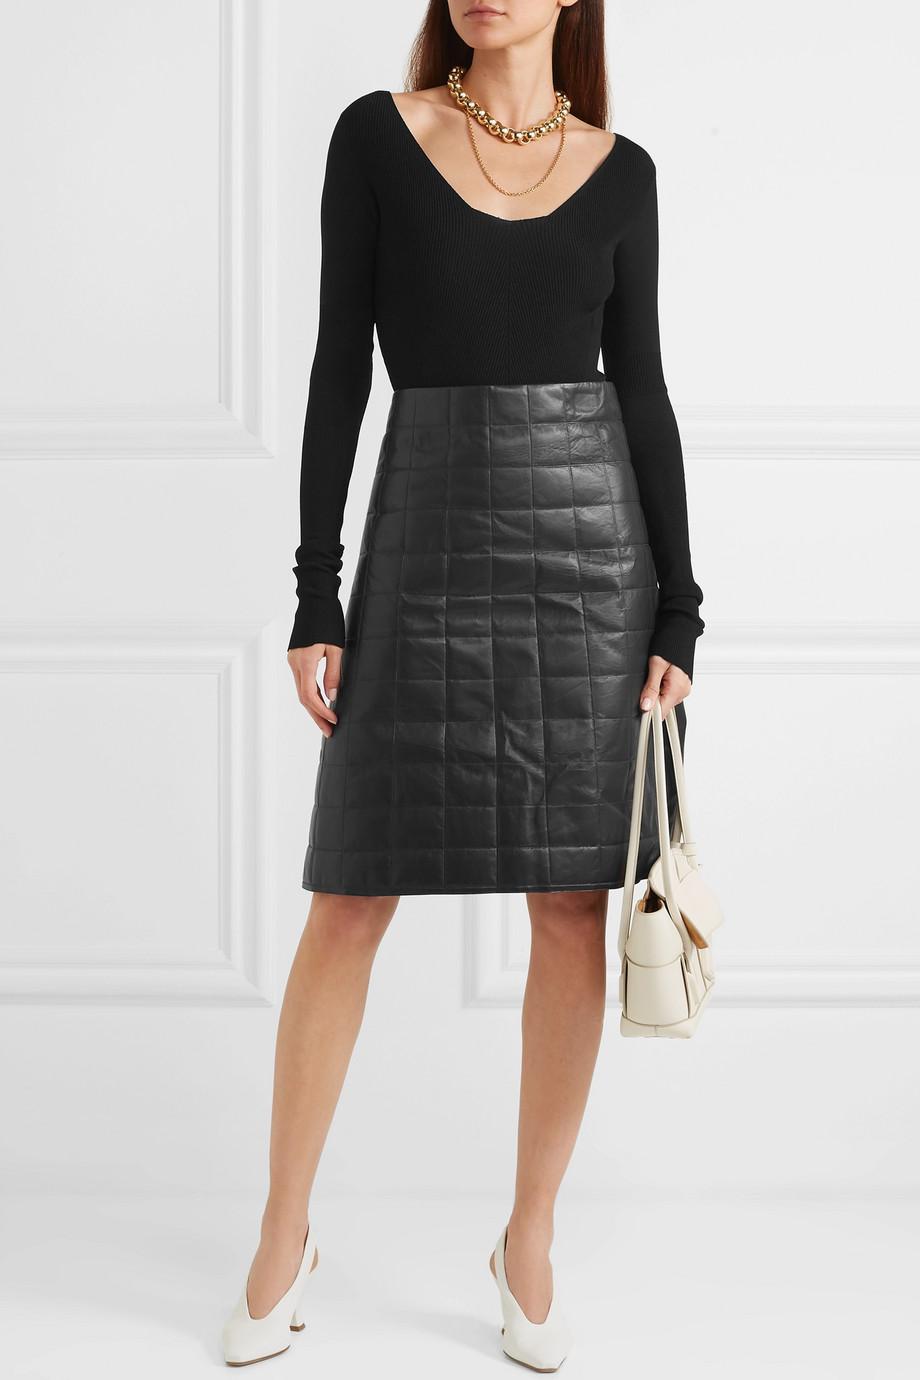 Bottega Veneta Ribbed-knit bodysuit